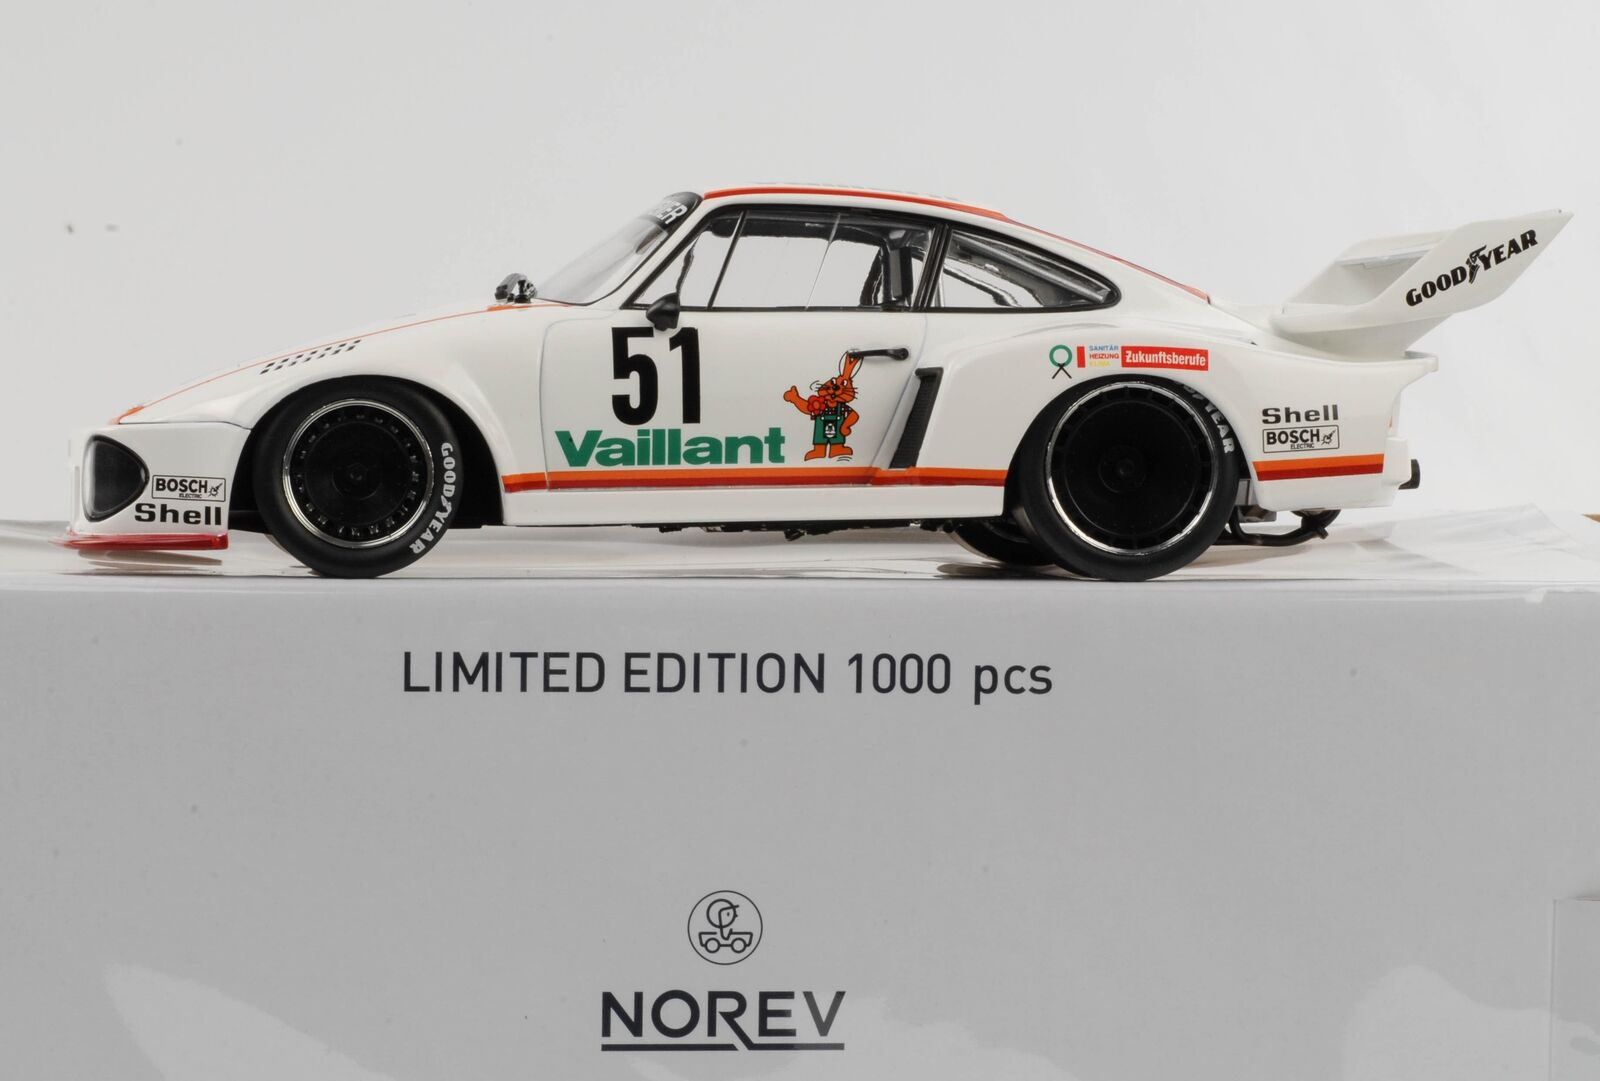 Porsche 935  51 DRM Zolder Wollek 1977 Vaillant 1 18 NOREV Miniature